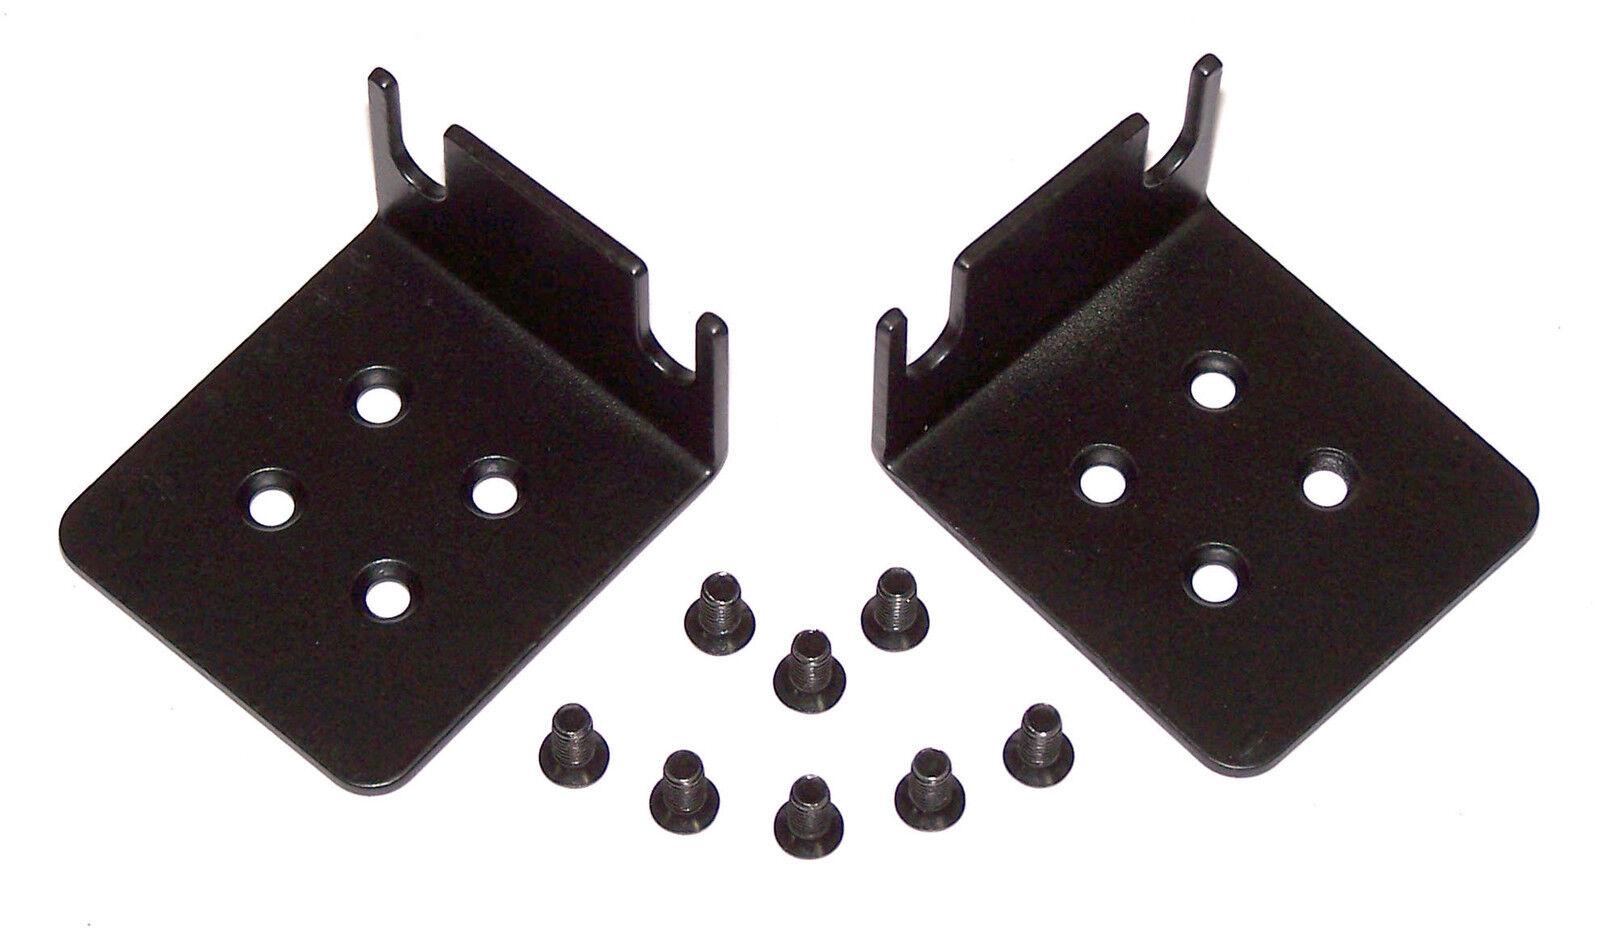 Cisco Linksys Srw2048 Rack Mount Kit, Rackmount, Rack Ears